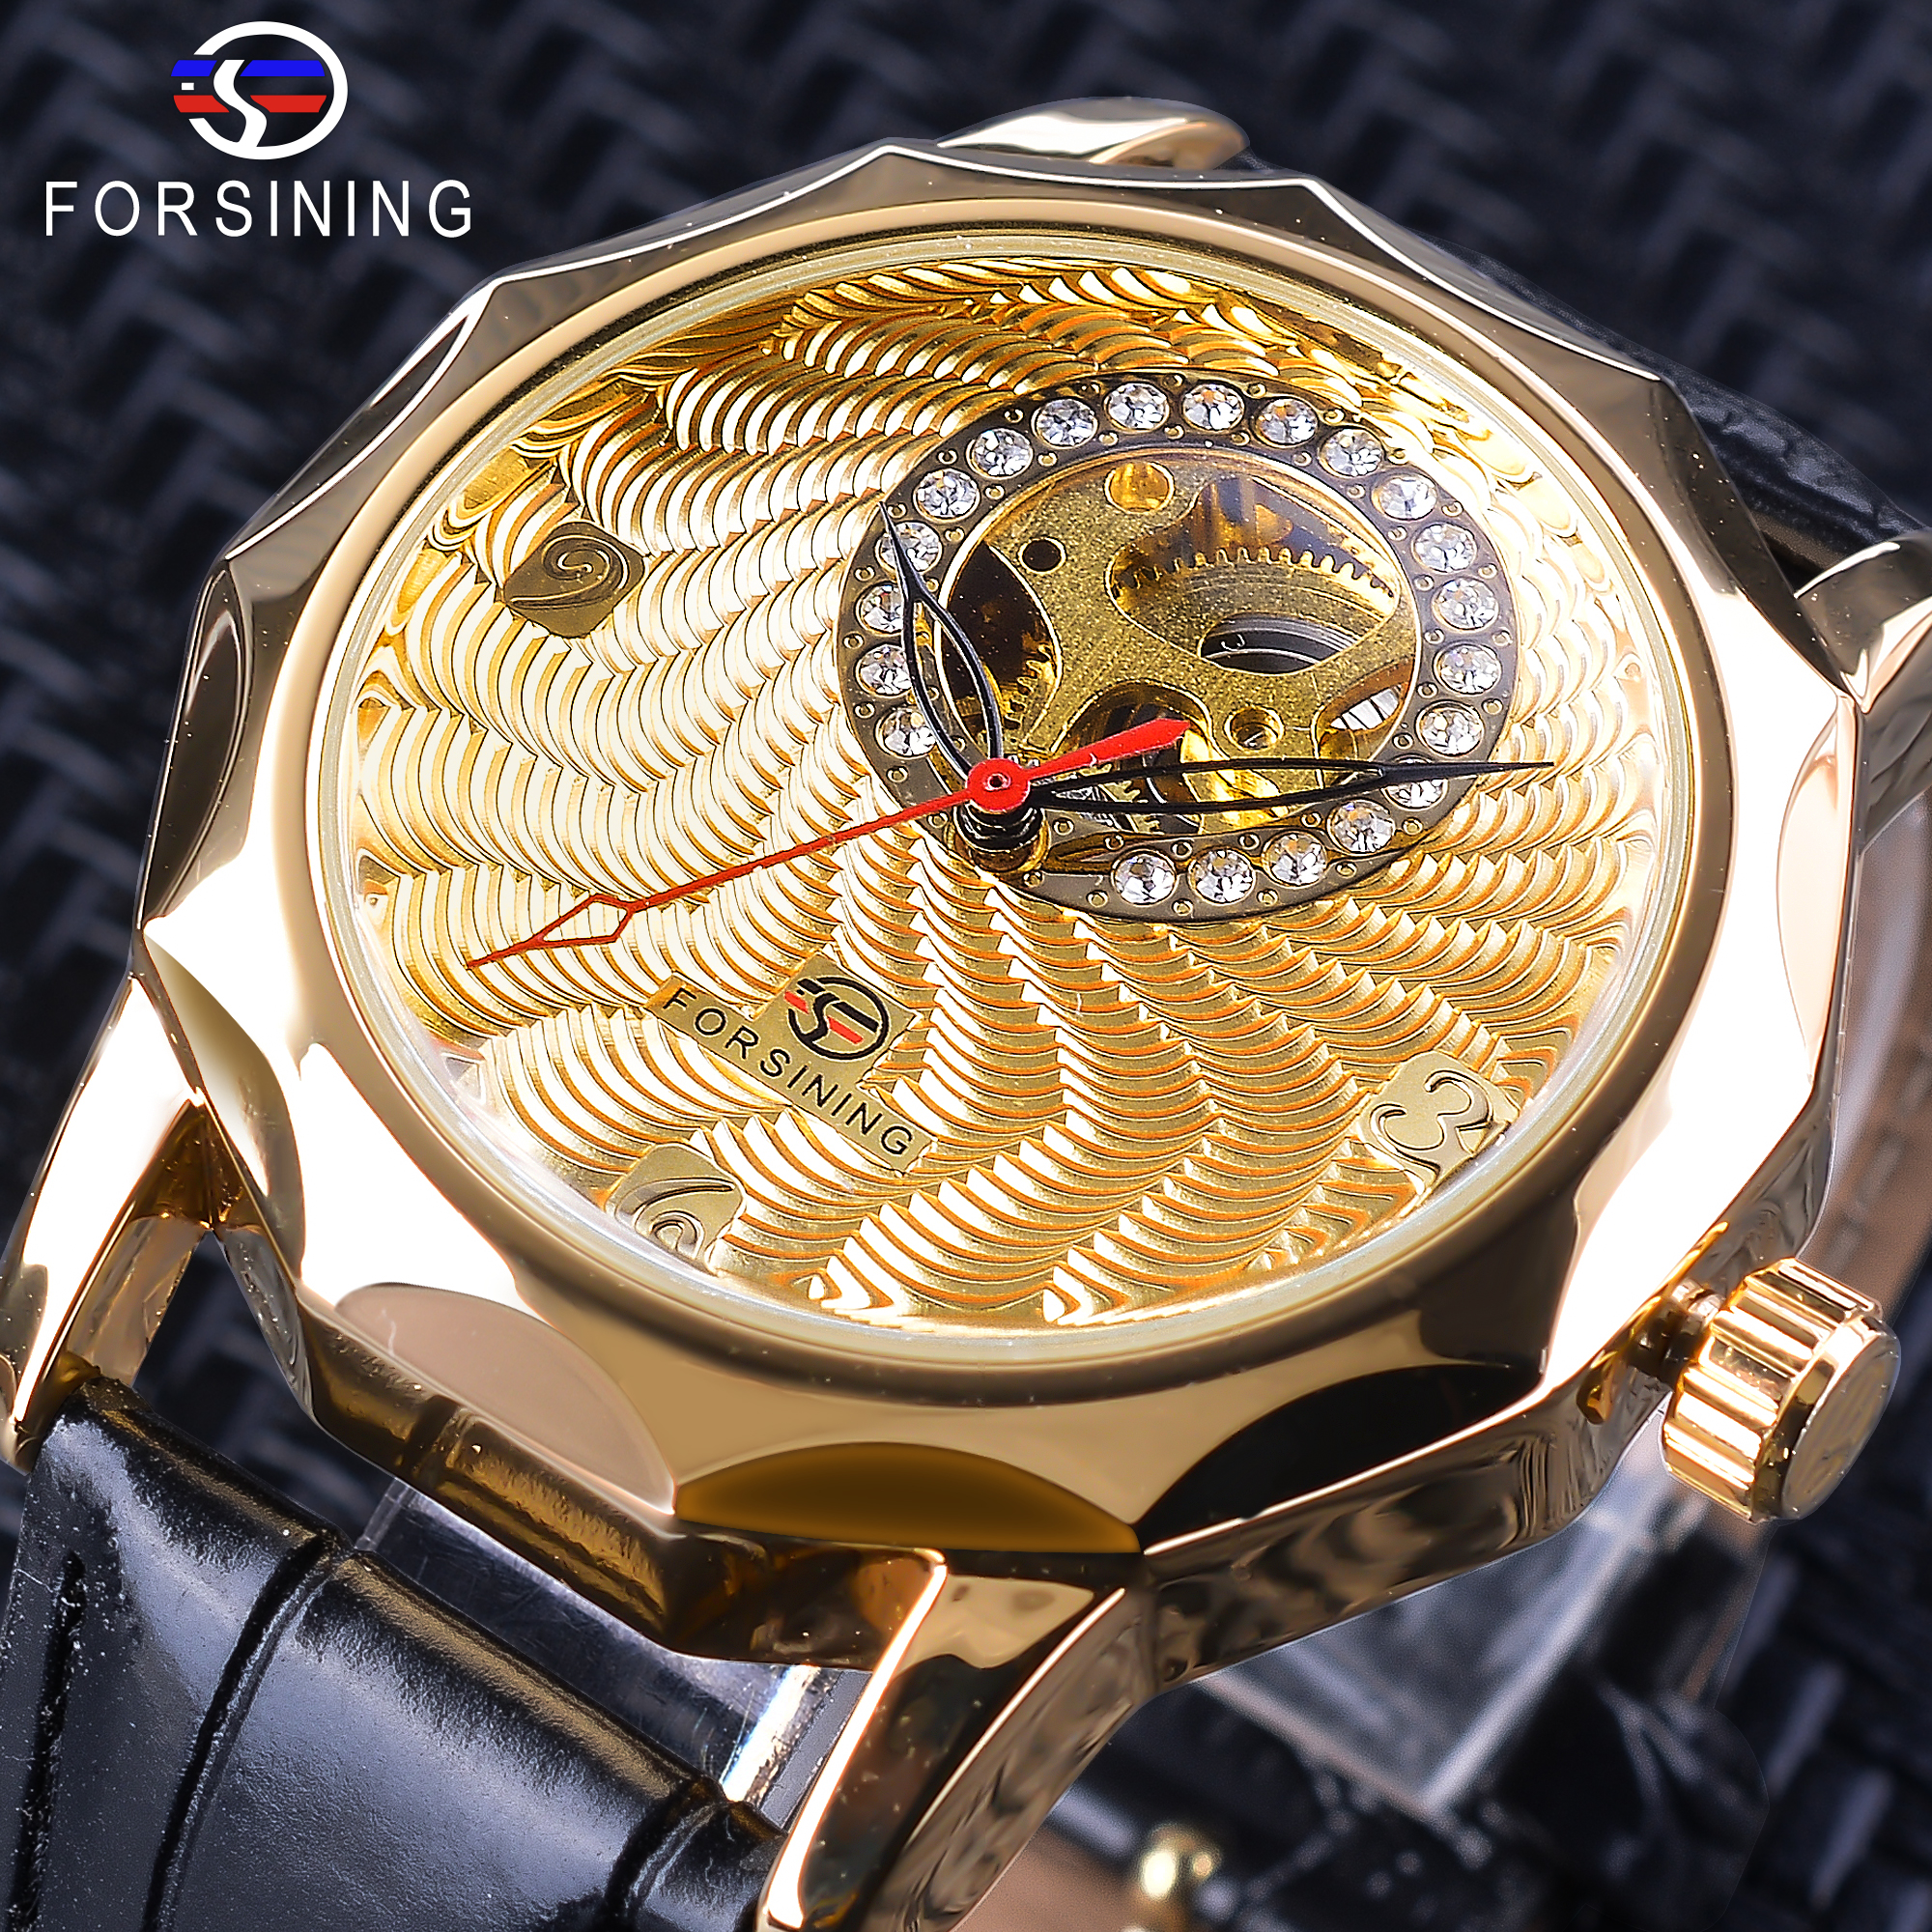 Forsining Fashion Diamond Display Unique Half Skeleton Design Men's Mechanical Watches Gold Watch Black Band Neutral Clock Male